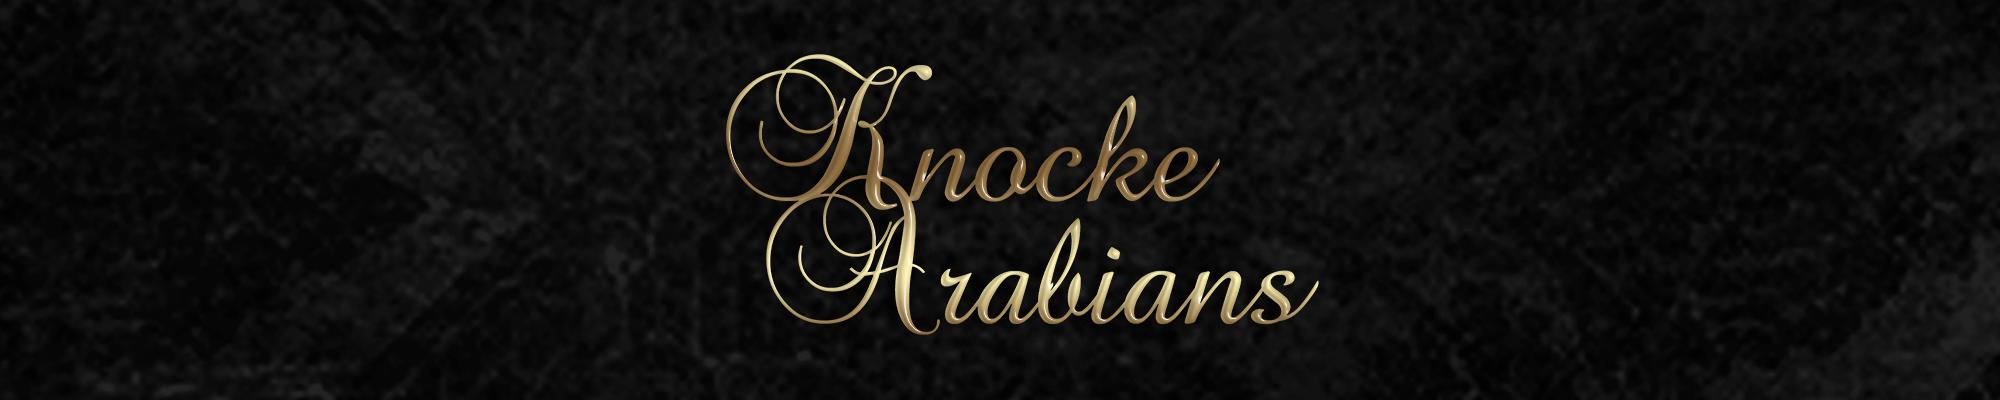 Knocke-arabians